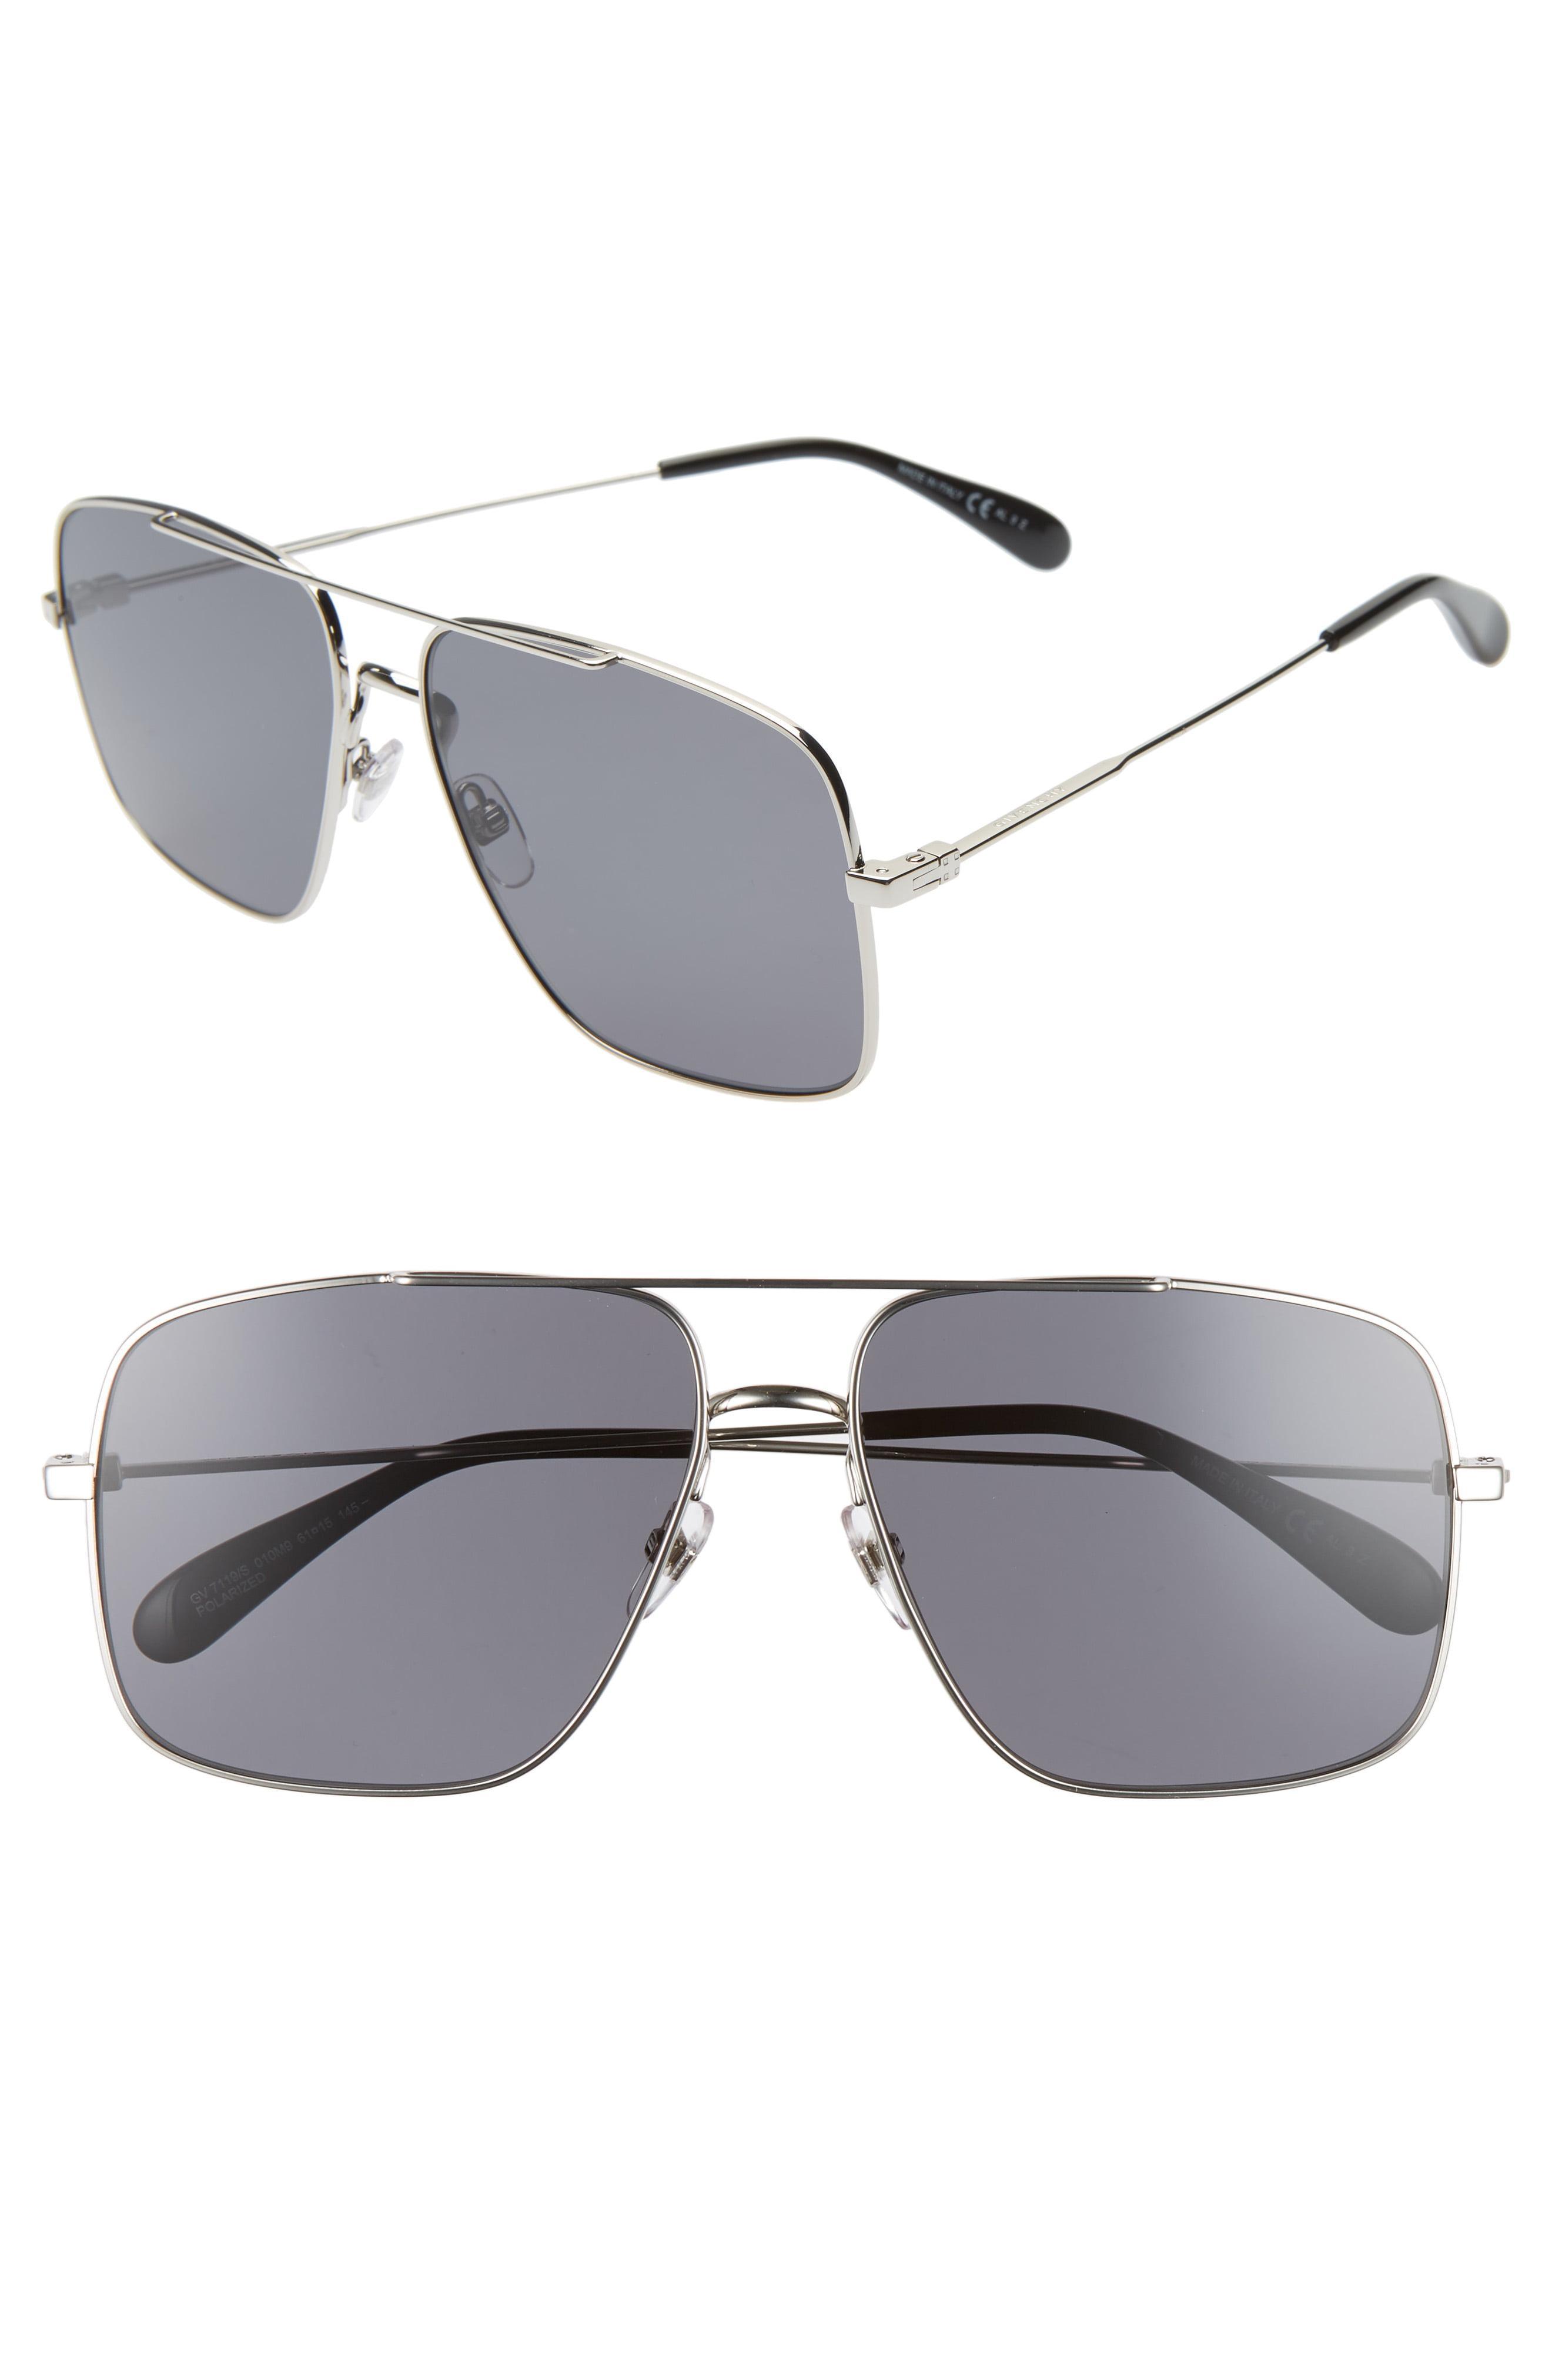 553f57430 Givenchy. Men's Metallic 61mm Polarized Square Sunglasses - Palladium